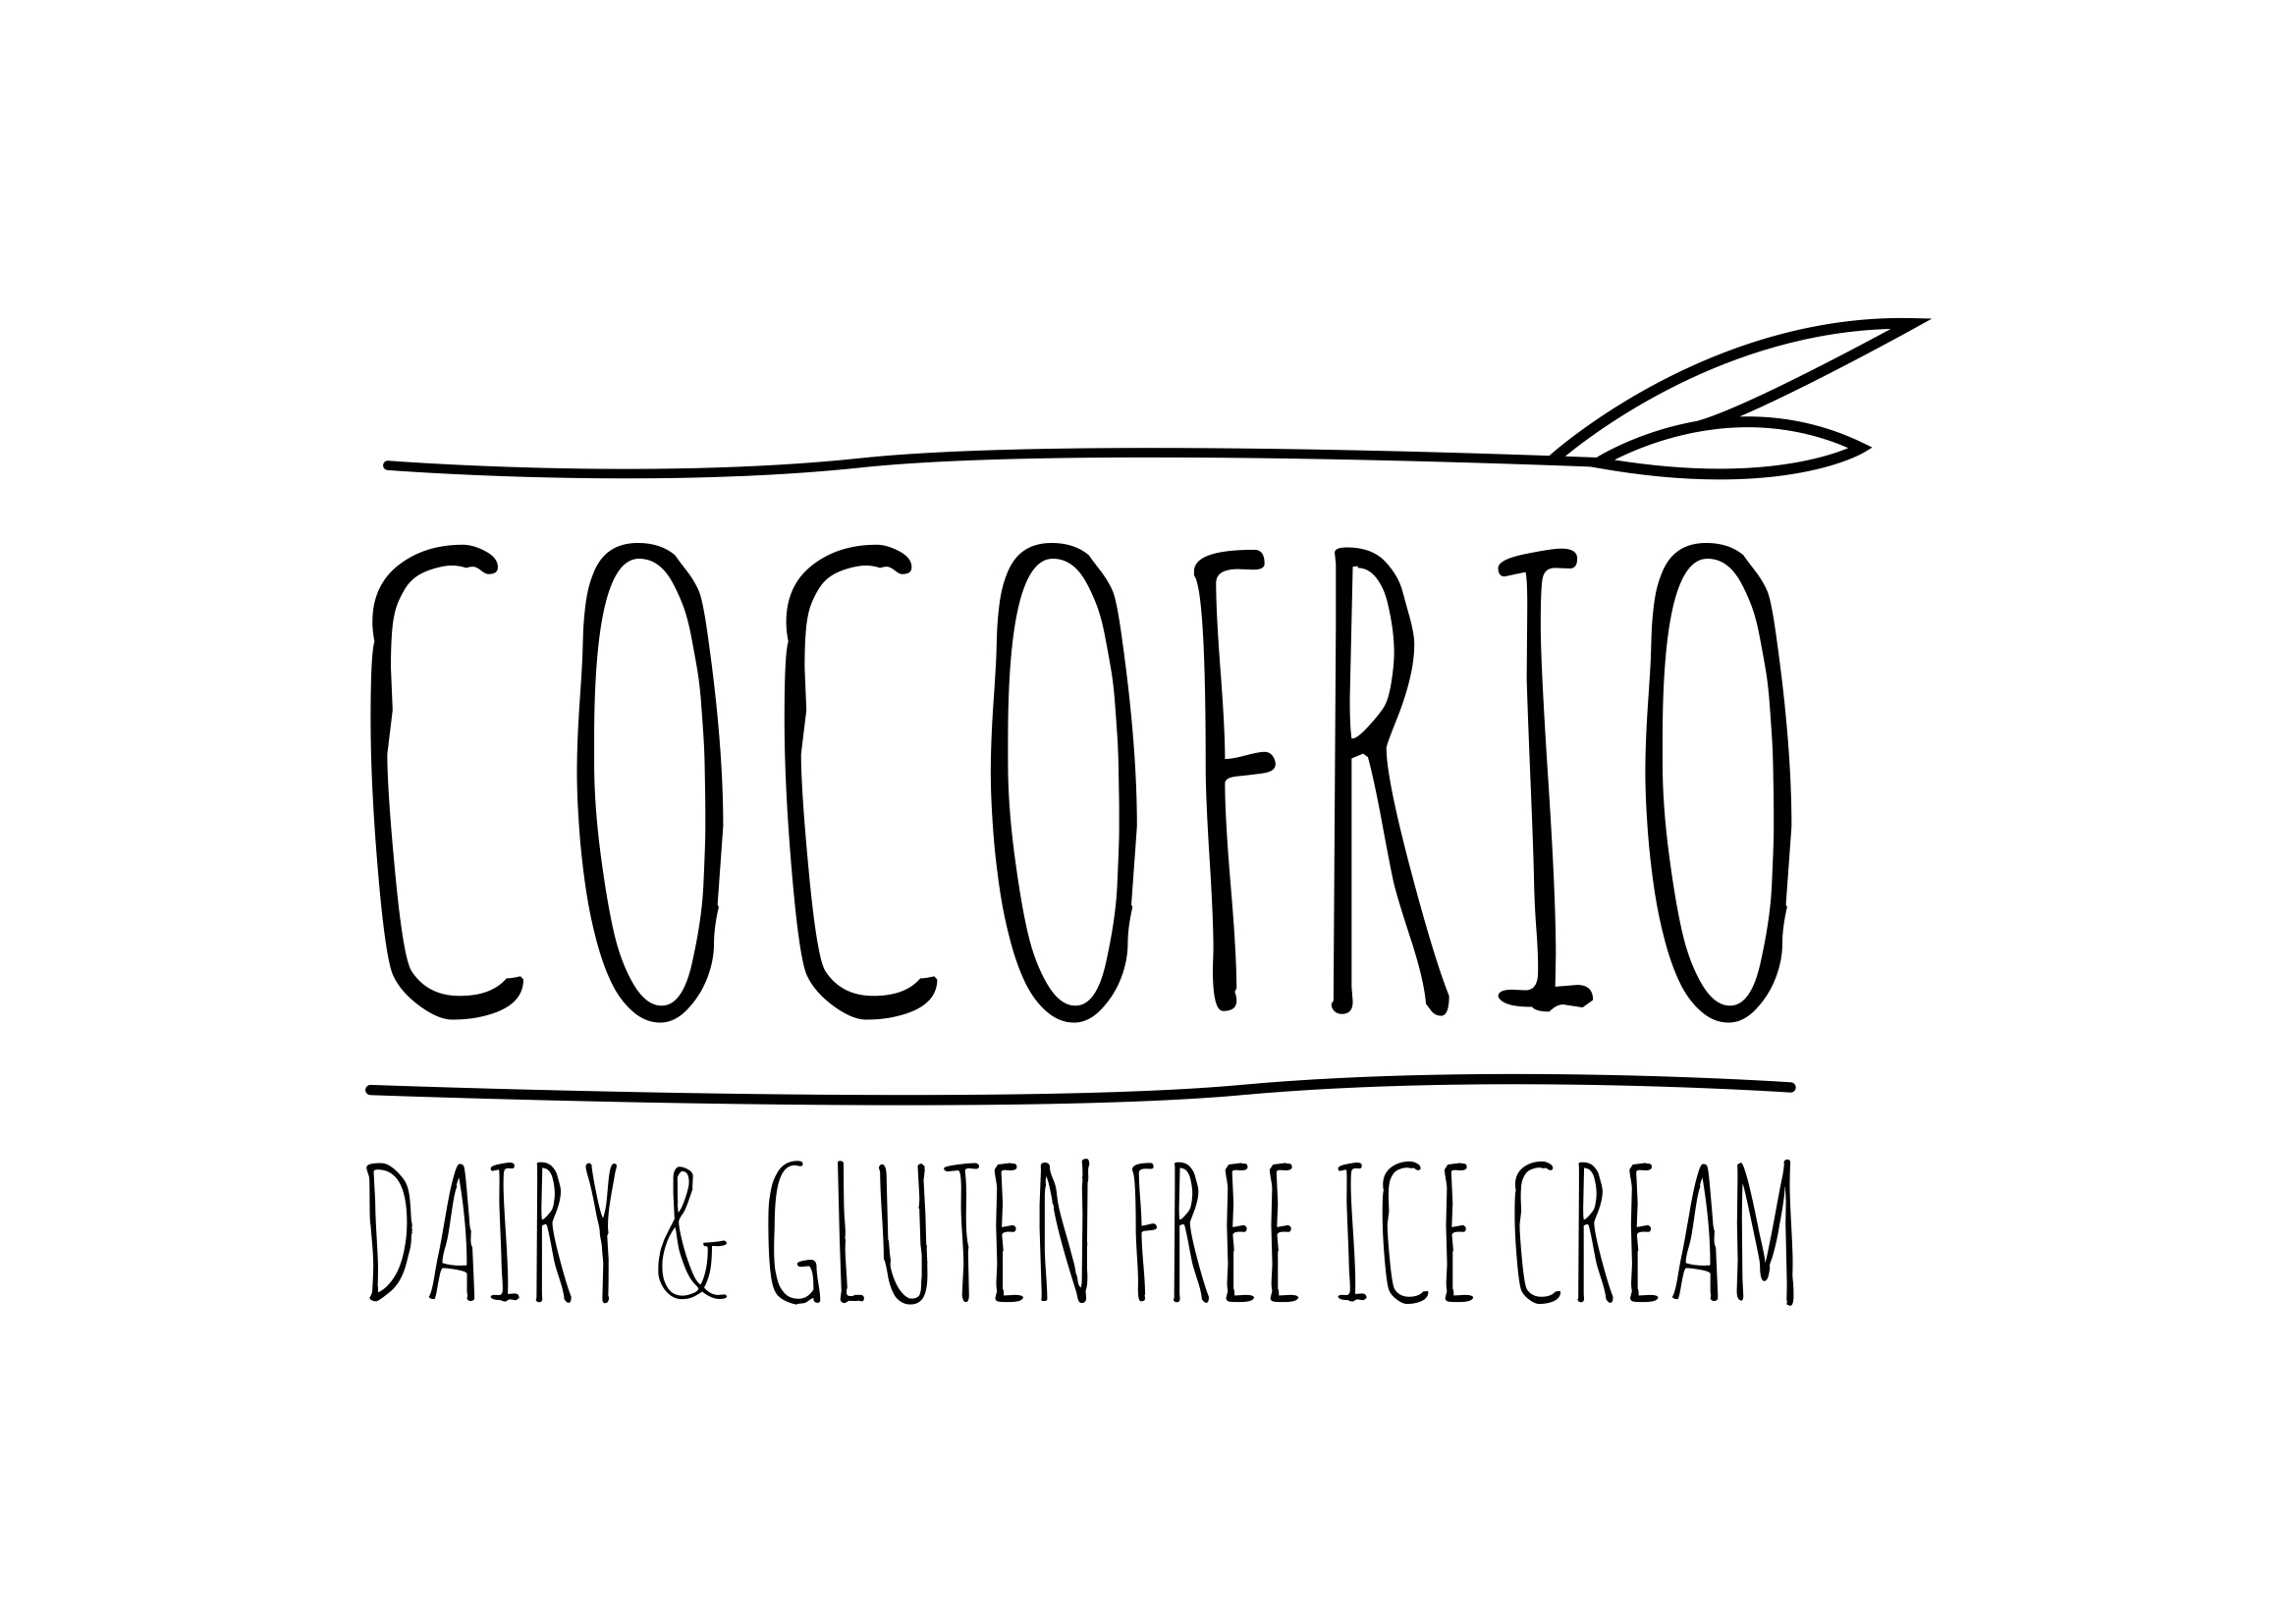 Cocofrio Icecream